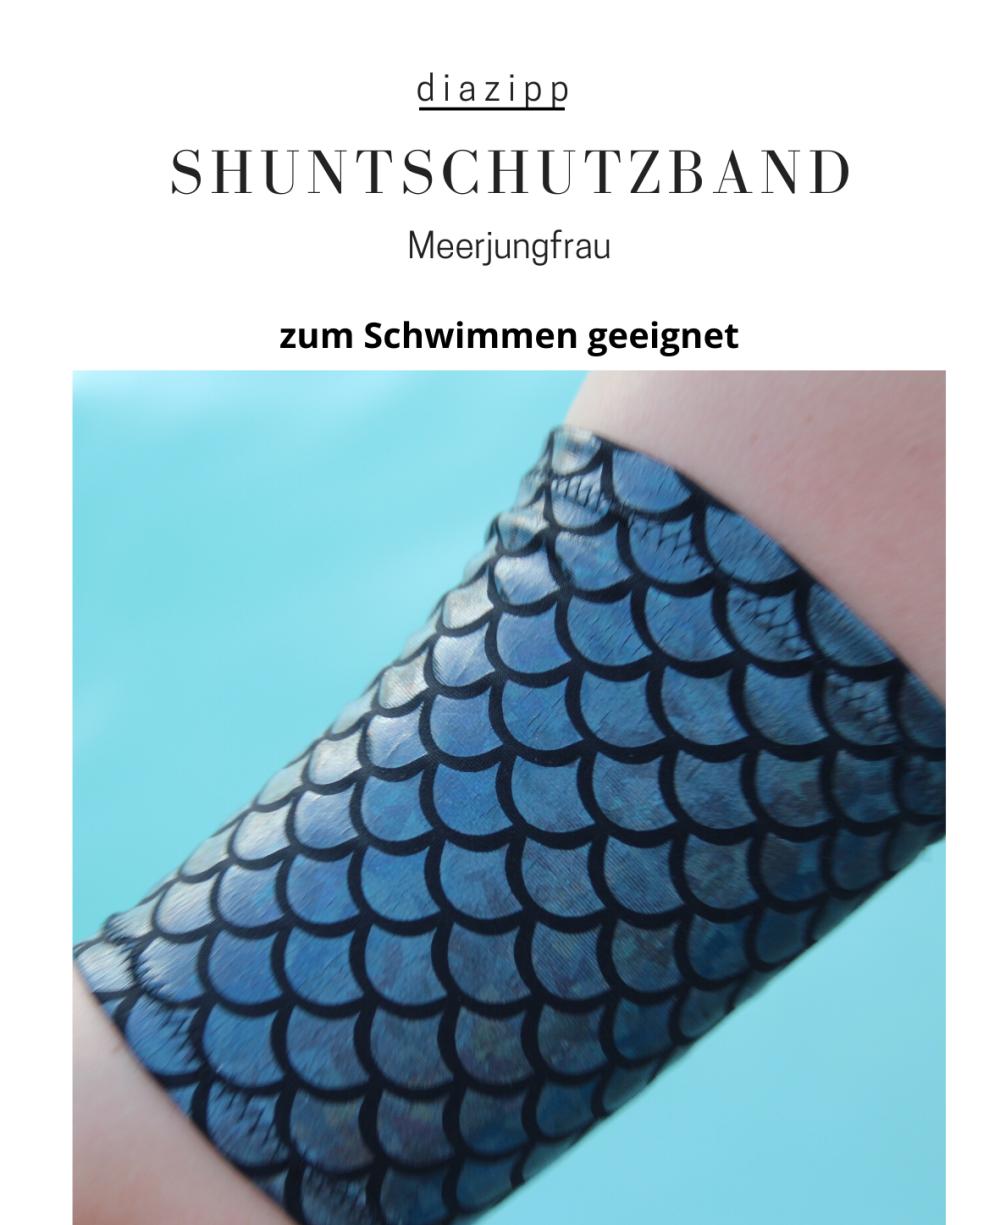 Meerjungfrau-damen-Shuntschutzband-für-dialysepatienten-diazipp